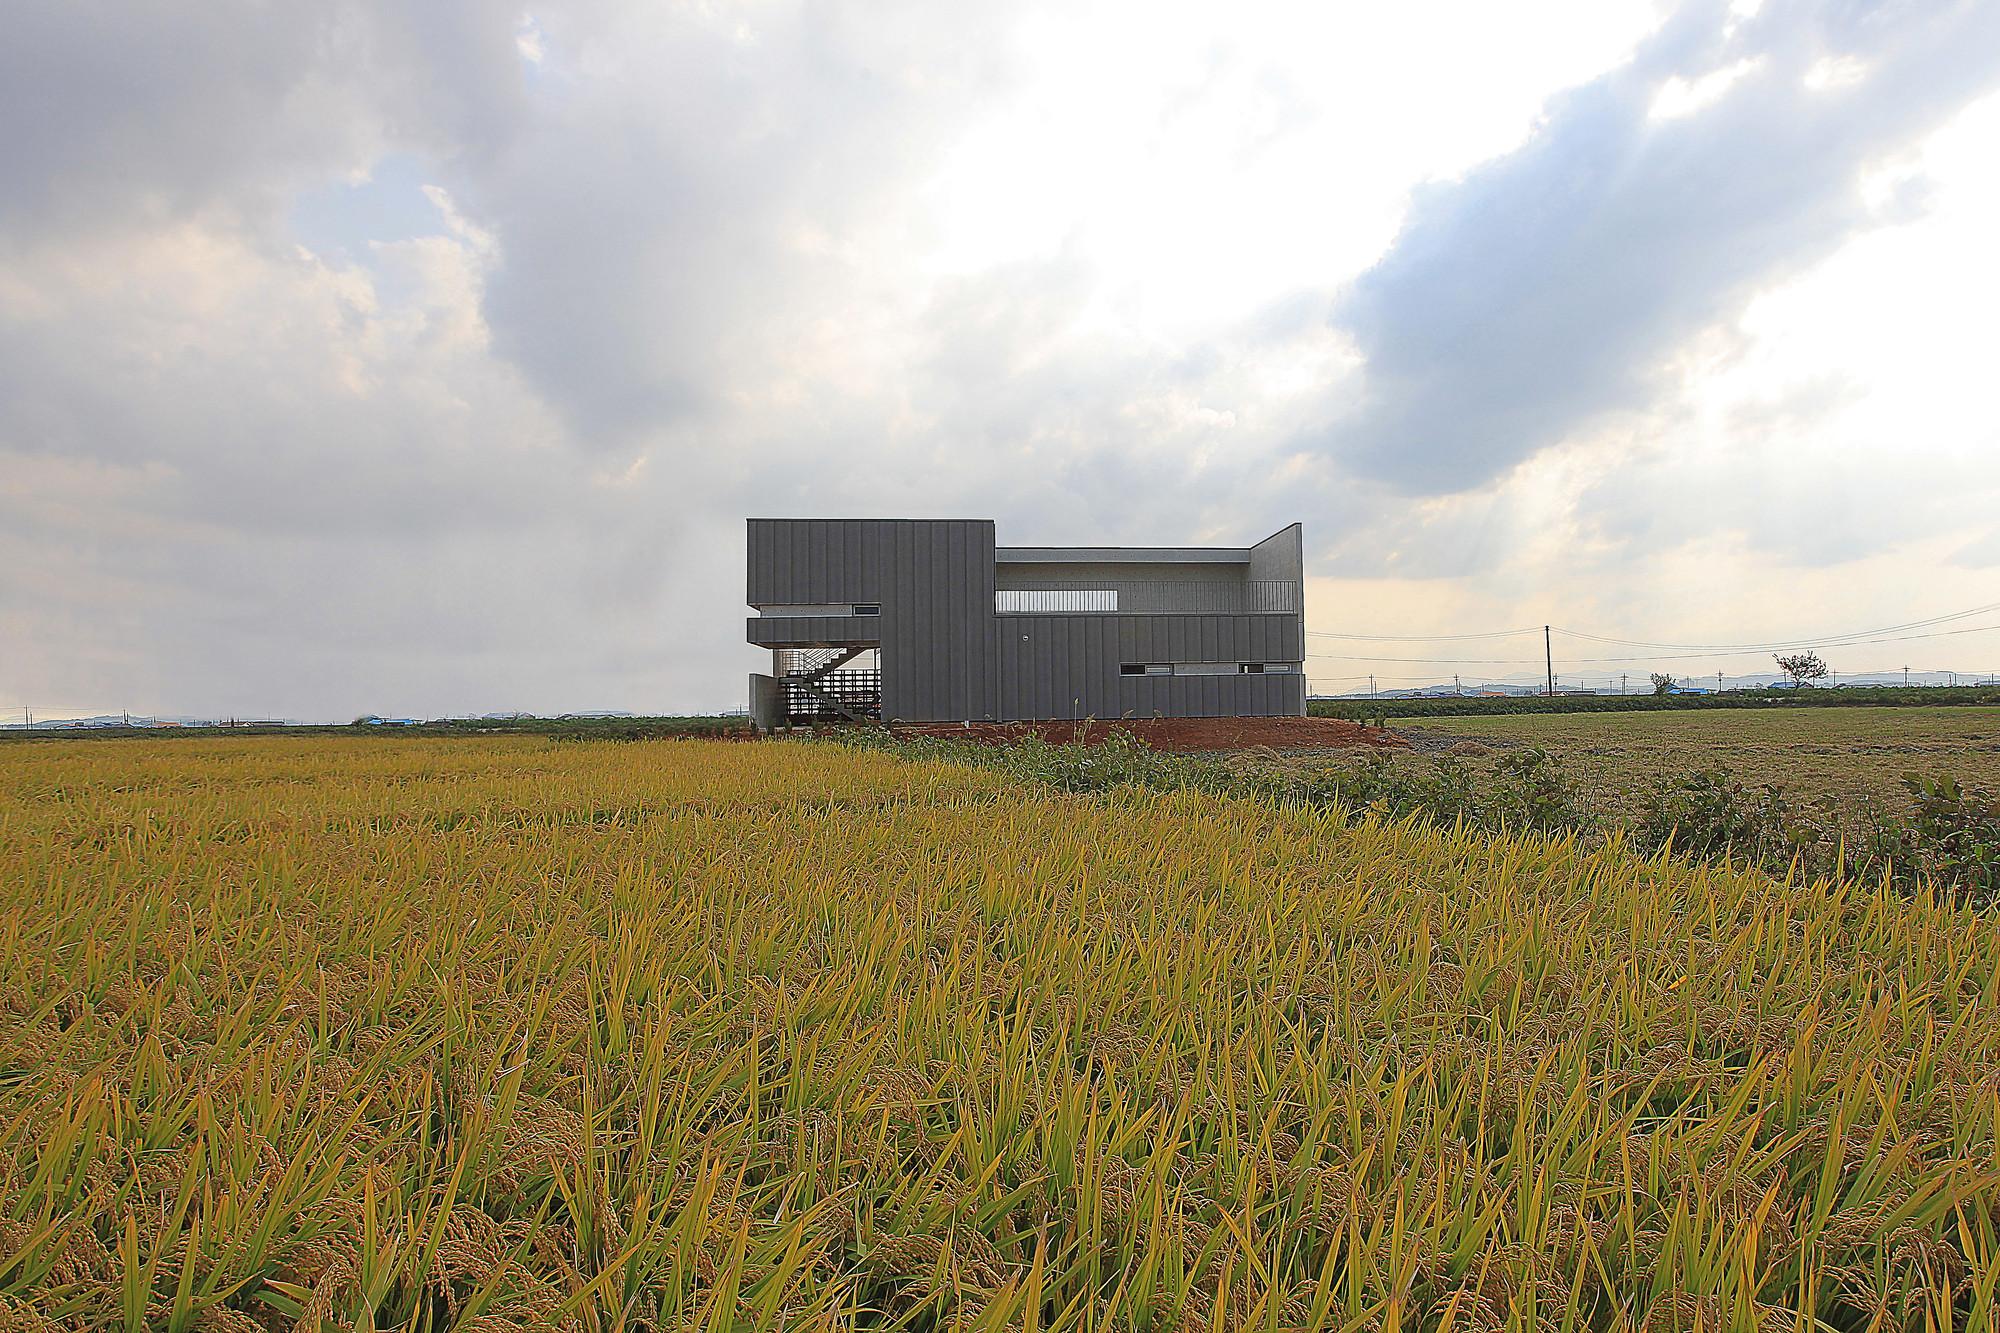 Bujang-li House / Oh Jongsang